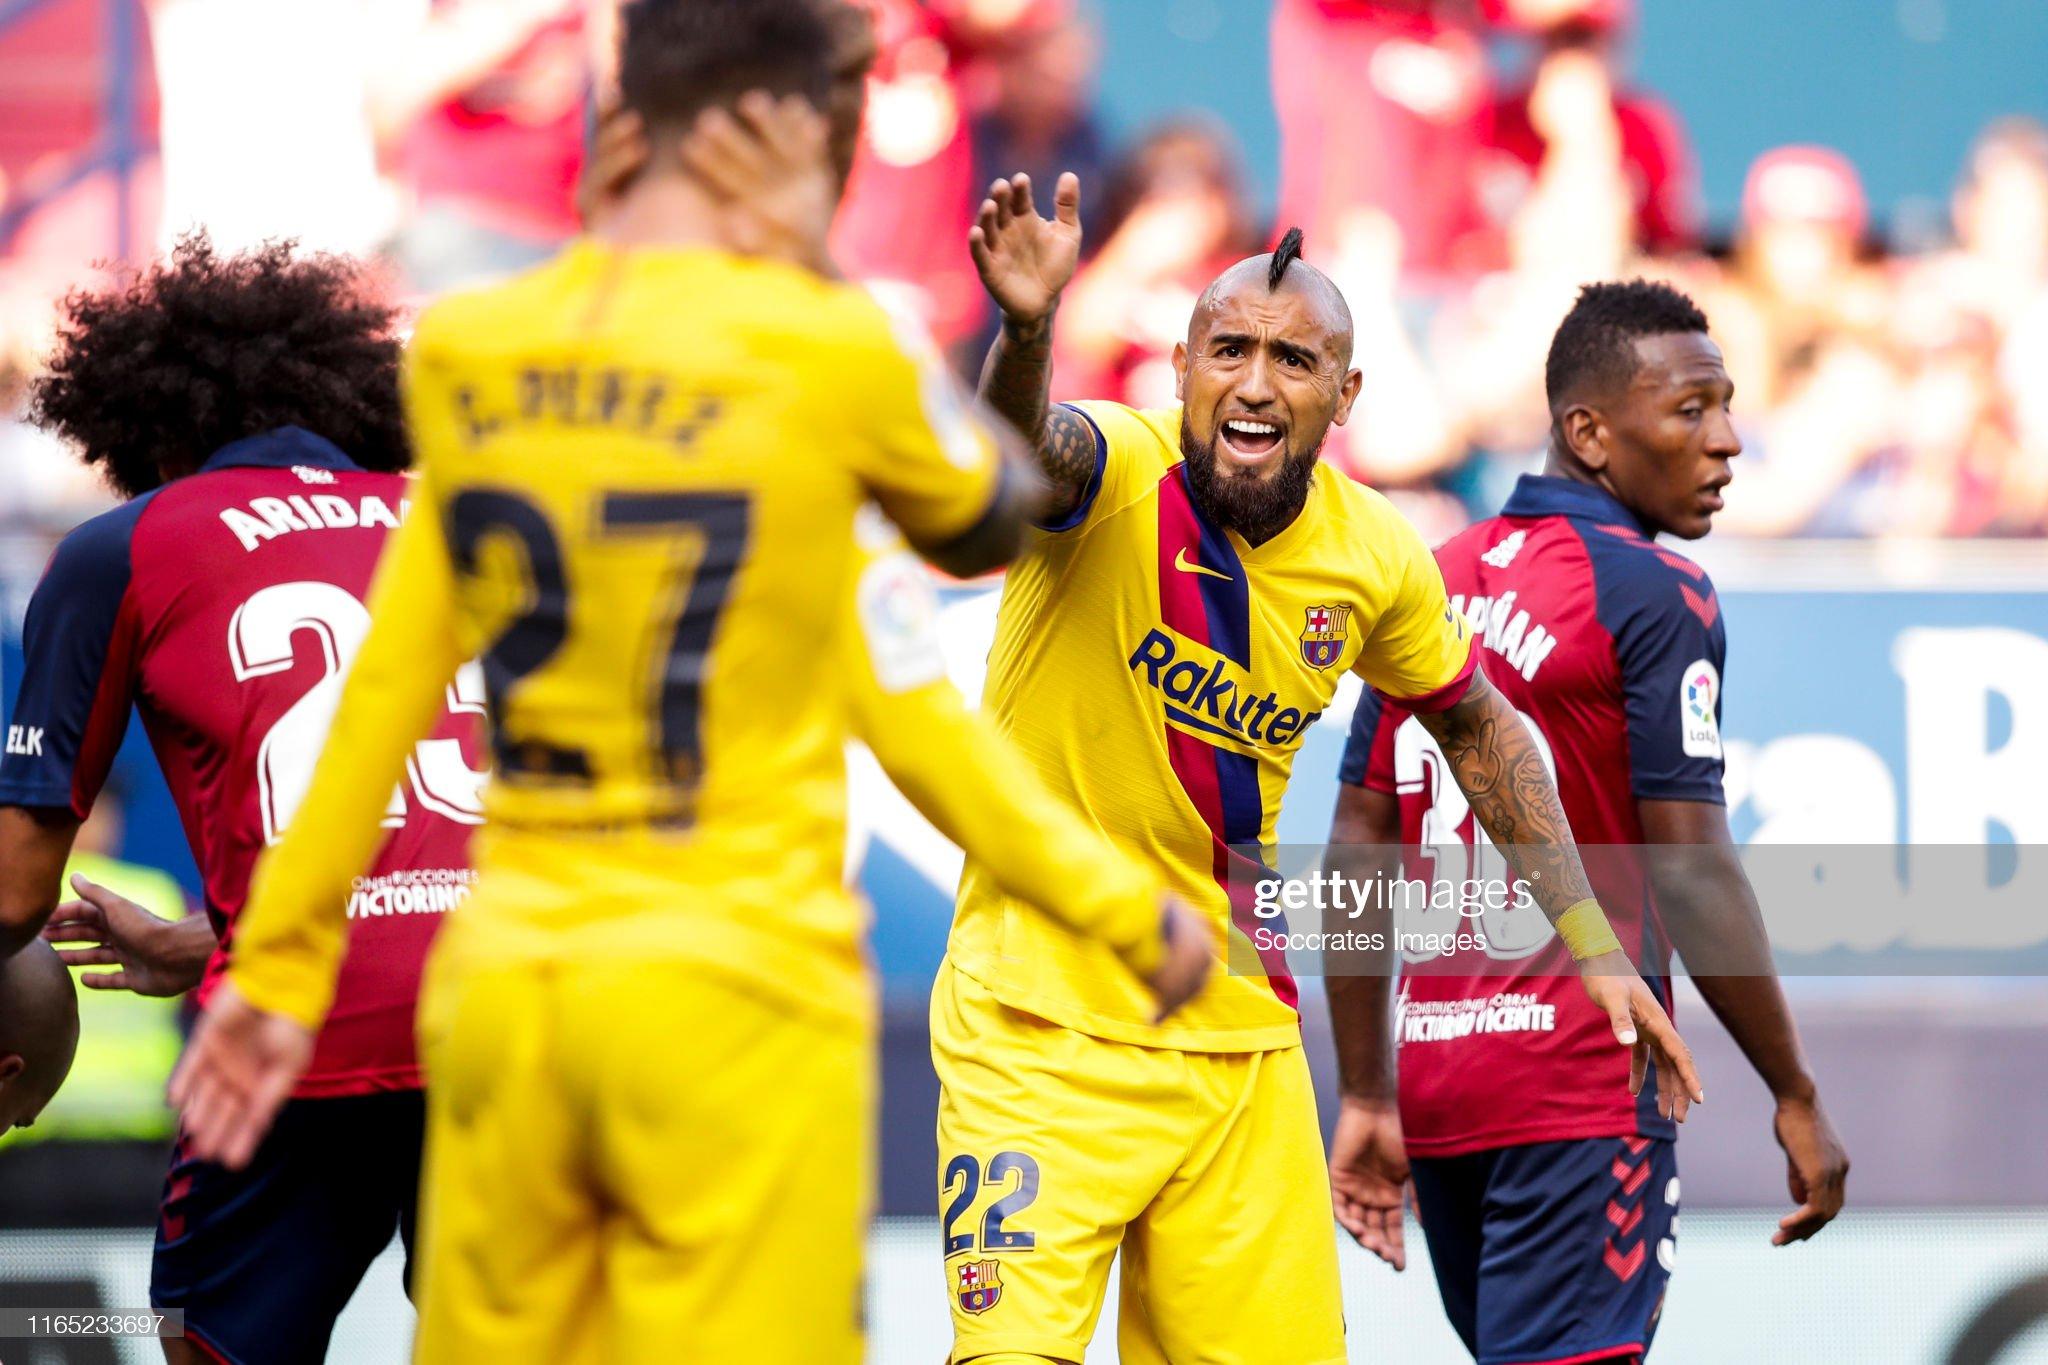 صور مباراة : أوساسونا - برشلونة 2-2 ( 31-08-2019 )  Arturo-vidal-of-fc-barcelona-during-the-la-liga-santander-match-v-picture-id1165233697?s=2048x2048